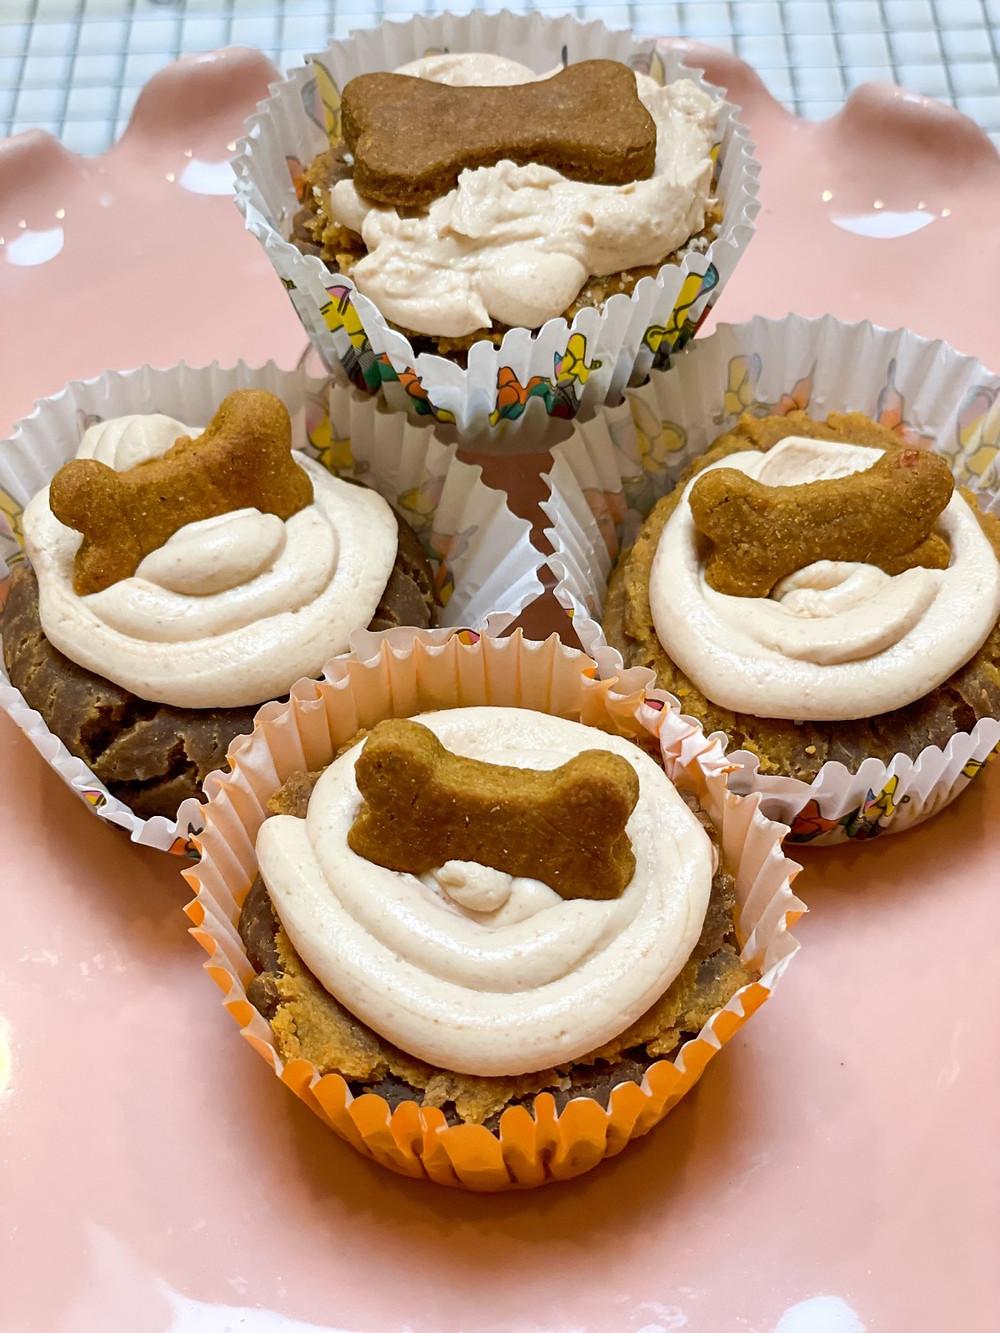 Cupcake Dog treats made with Dough ReMia's Doggie Dough